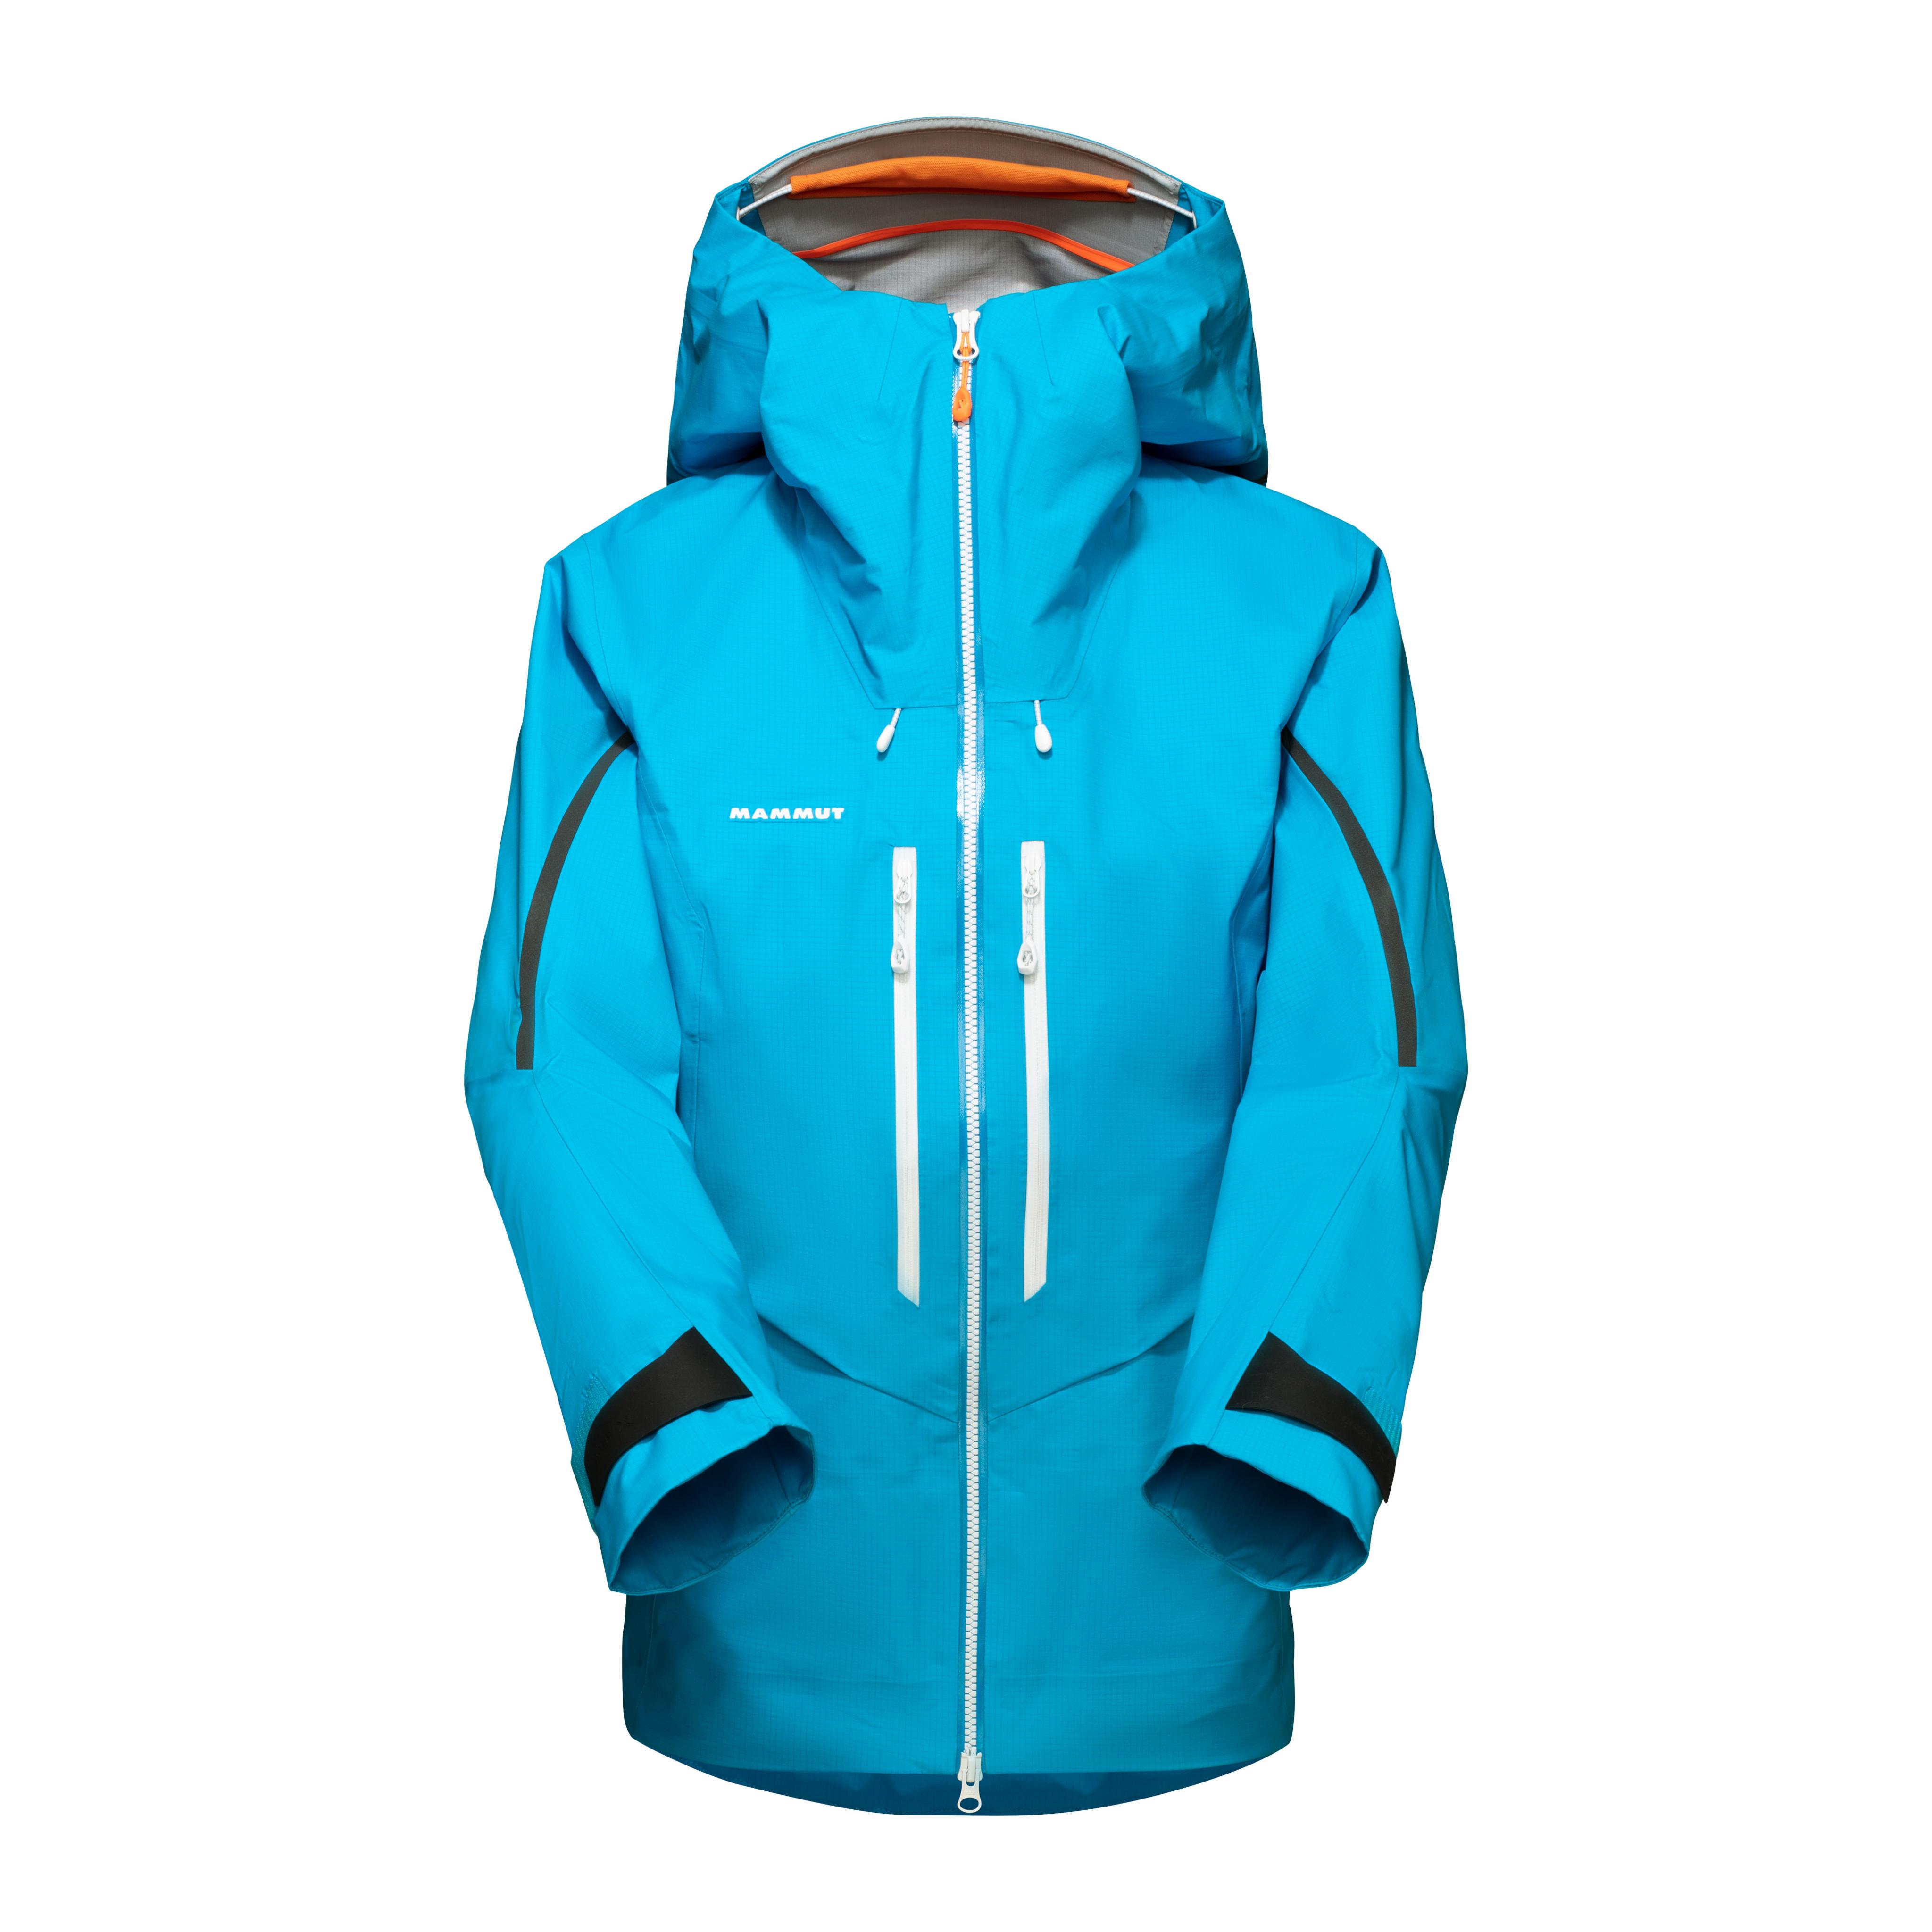 Nordwand Advanced HS Hooded Jacket Women - sky, XS thumbnail